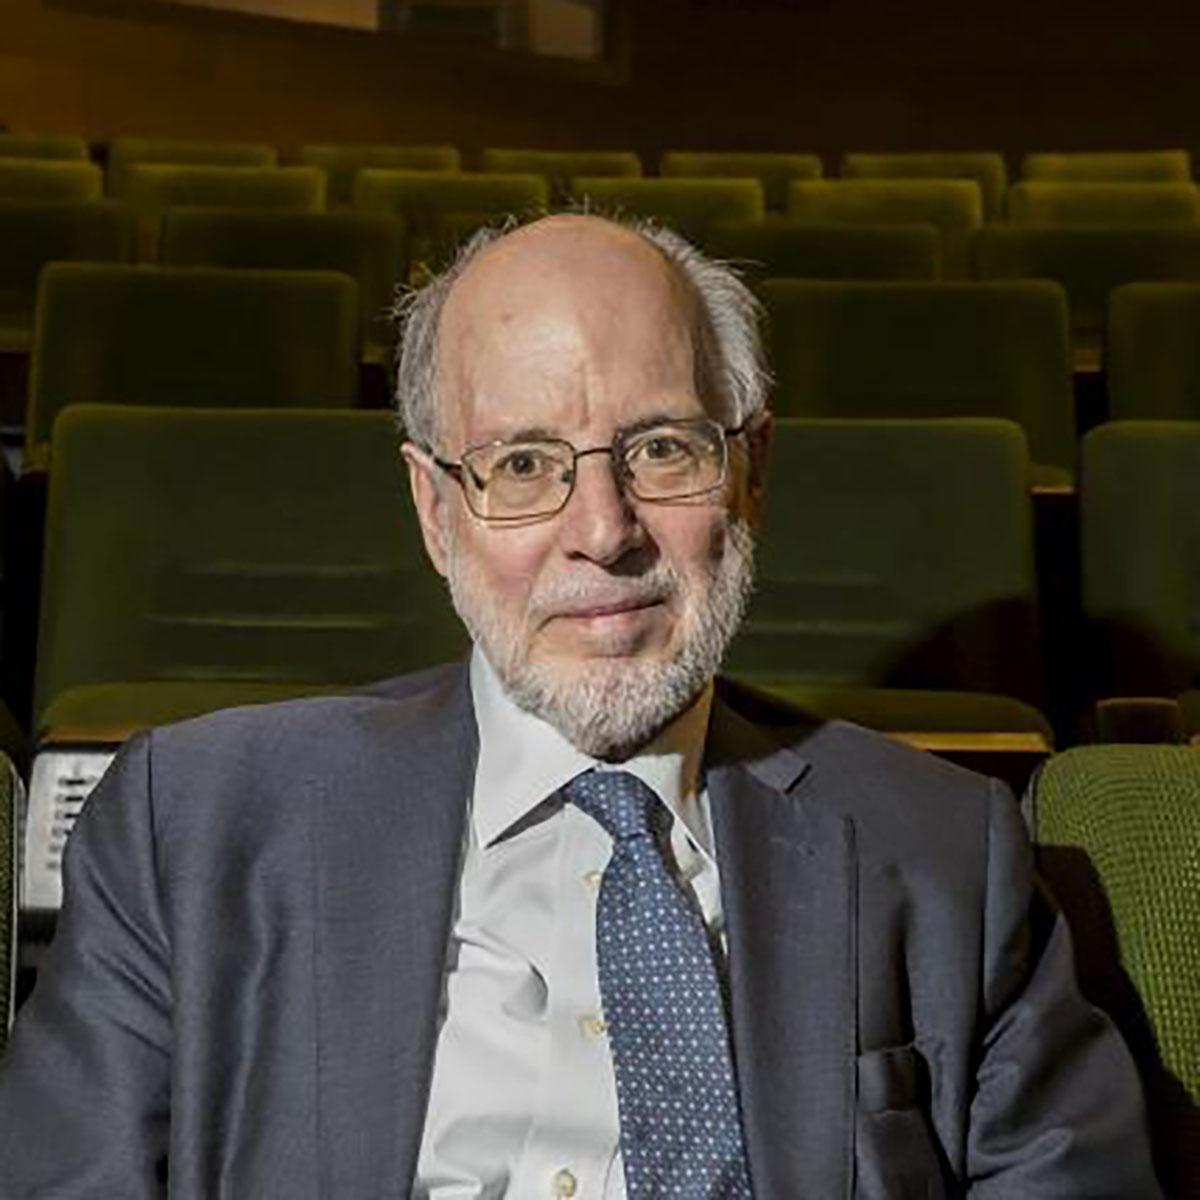 Dr. Diego Gracia